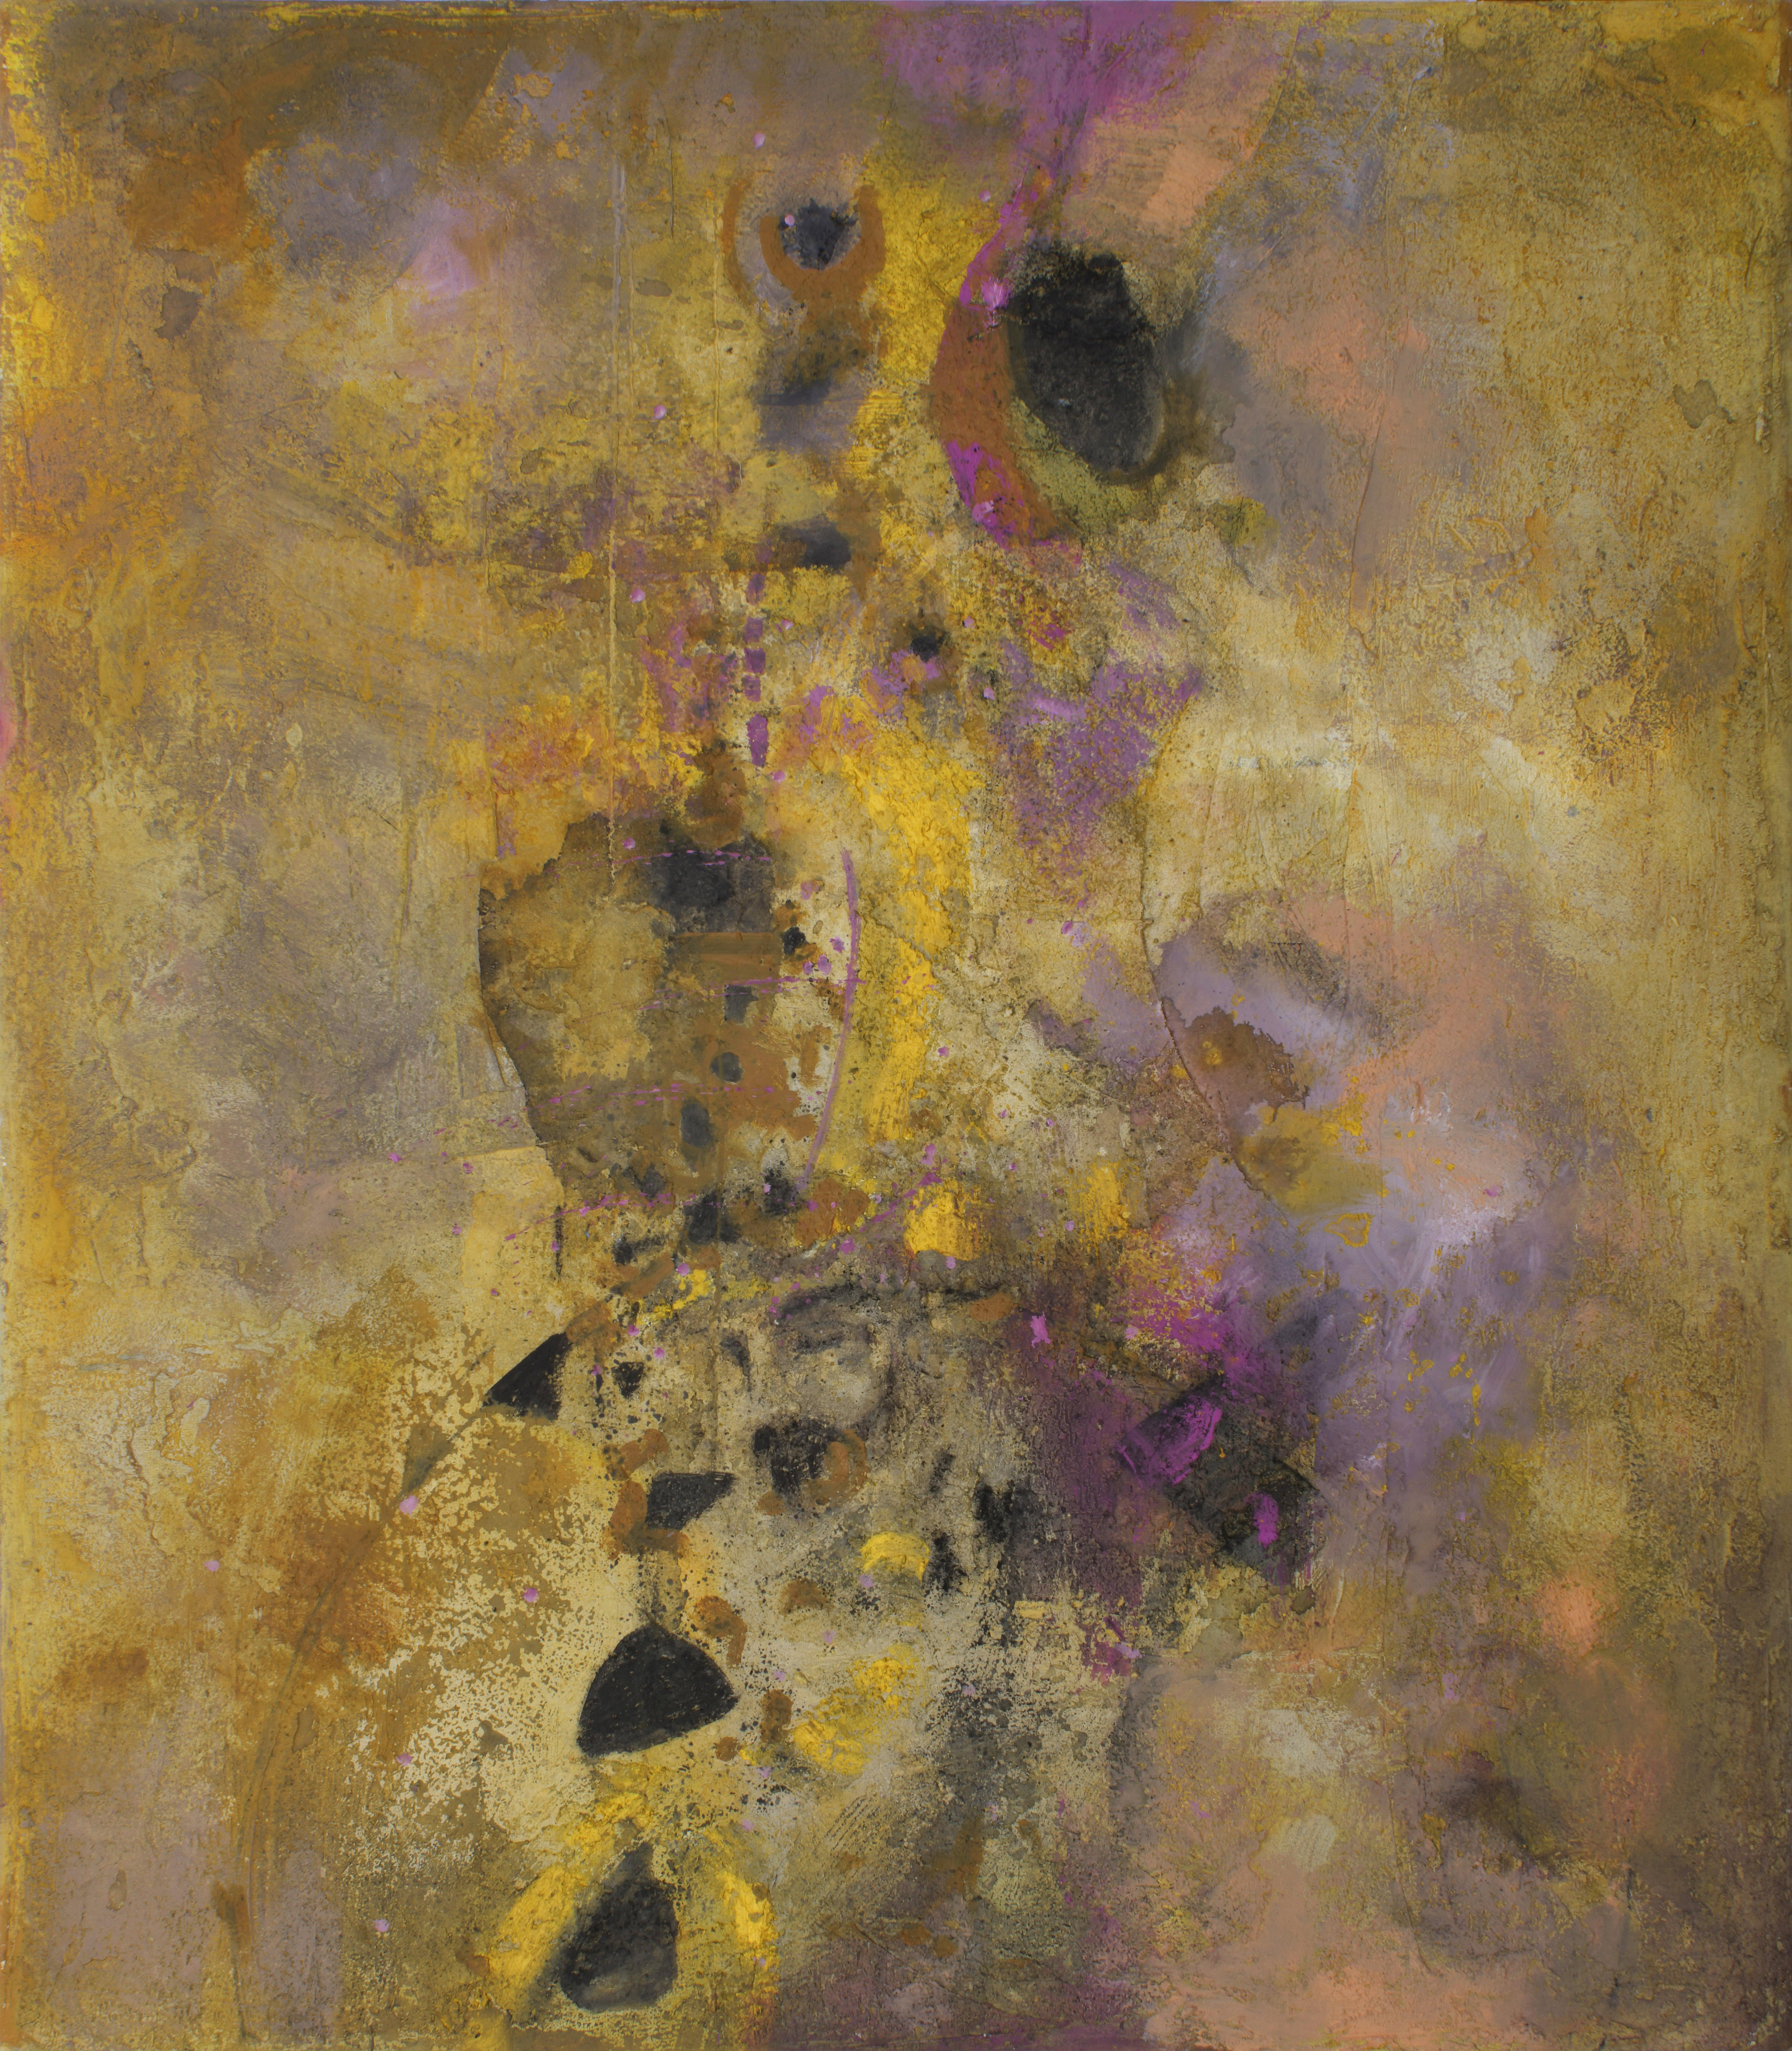 Texturas invisibles óleo s/tela 160 x  140 cms. / 63 x 55 inches